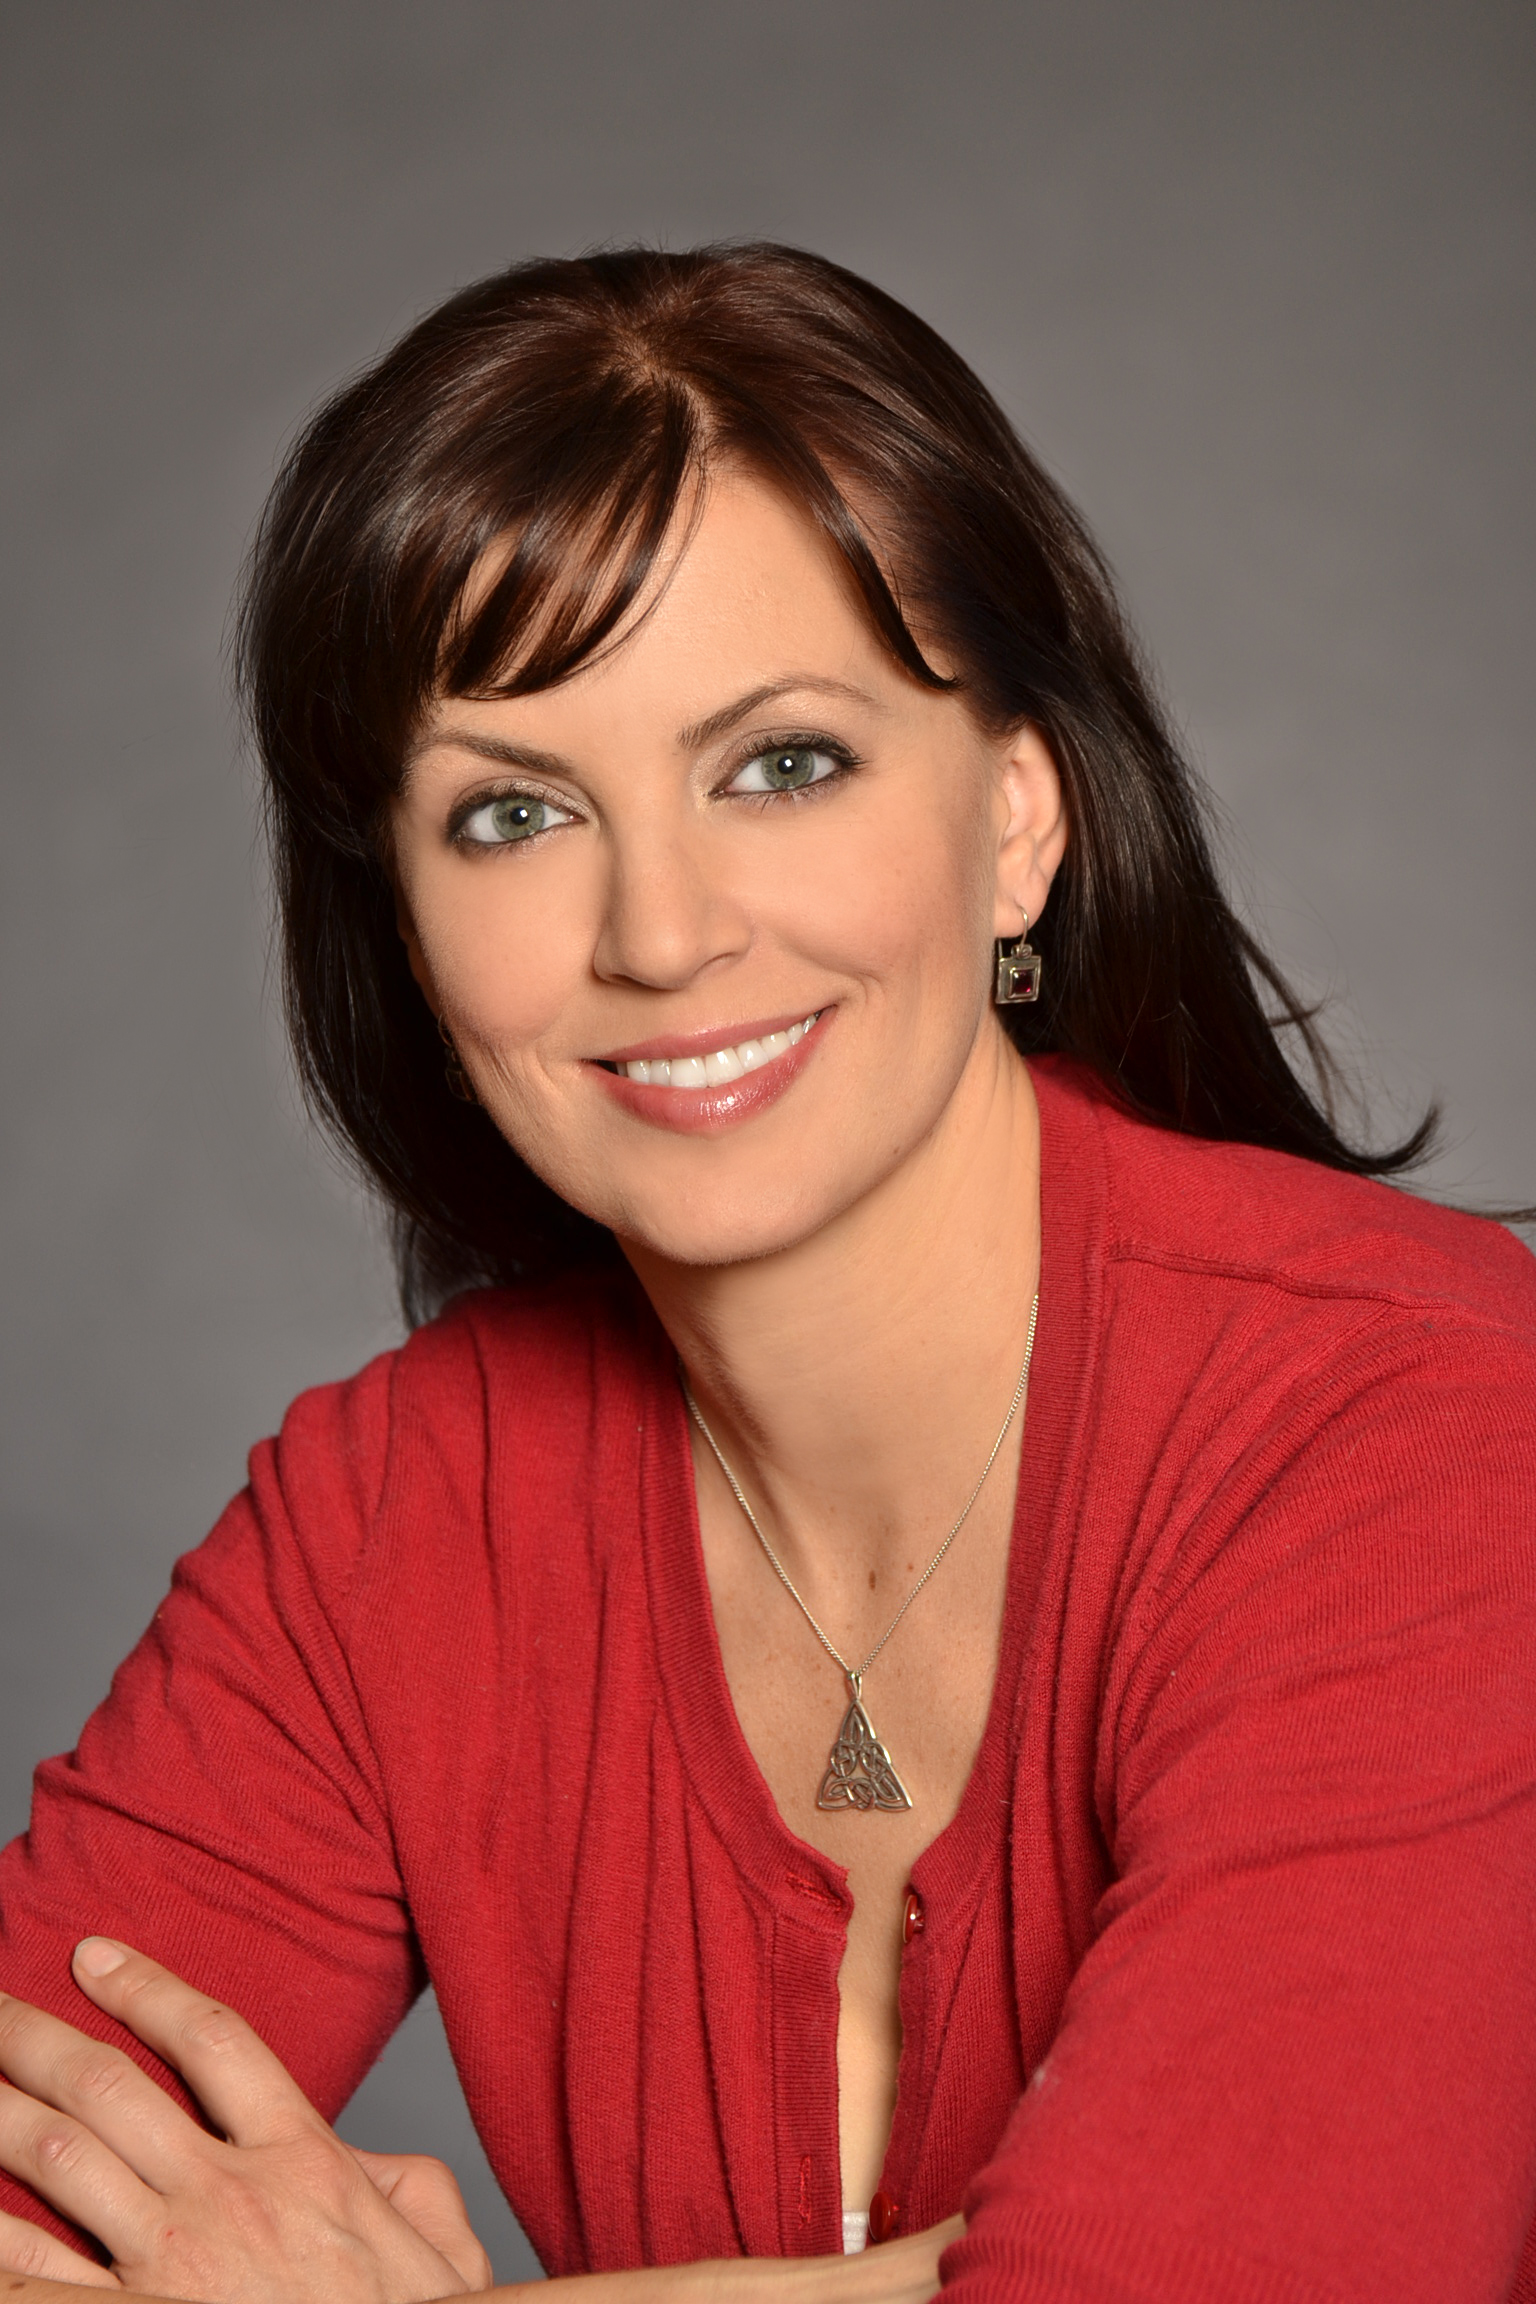 Crystal Dietz-Garcia, Agent in Chandler, AZ - 9285552_1405837075_o